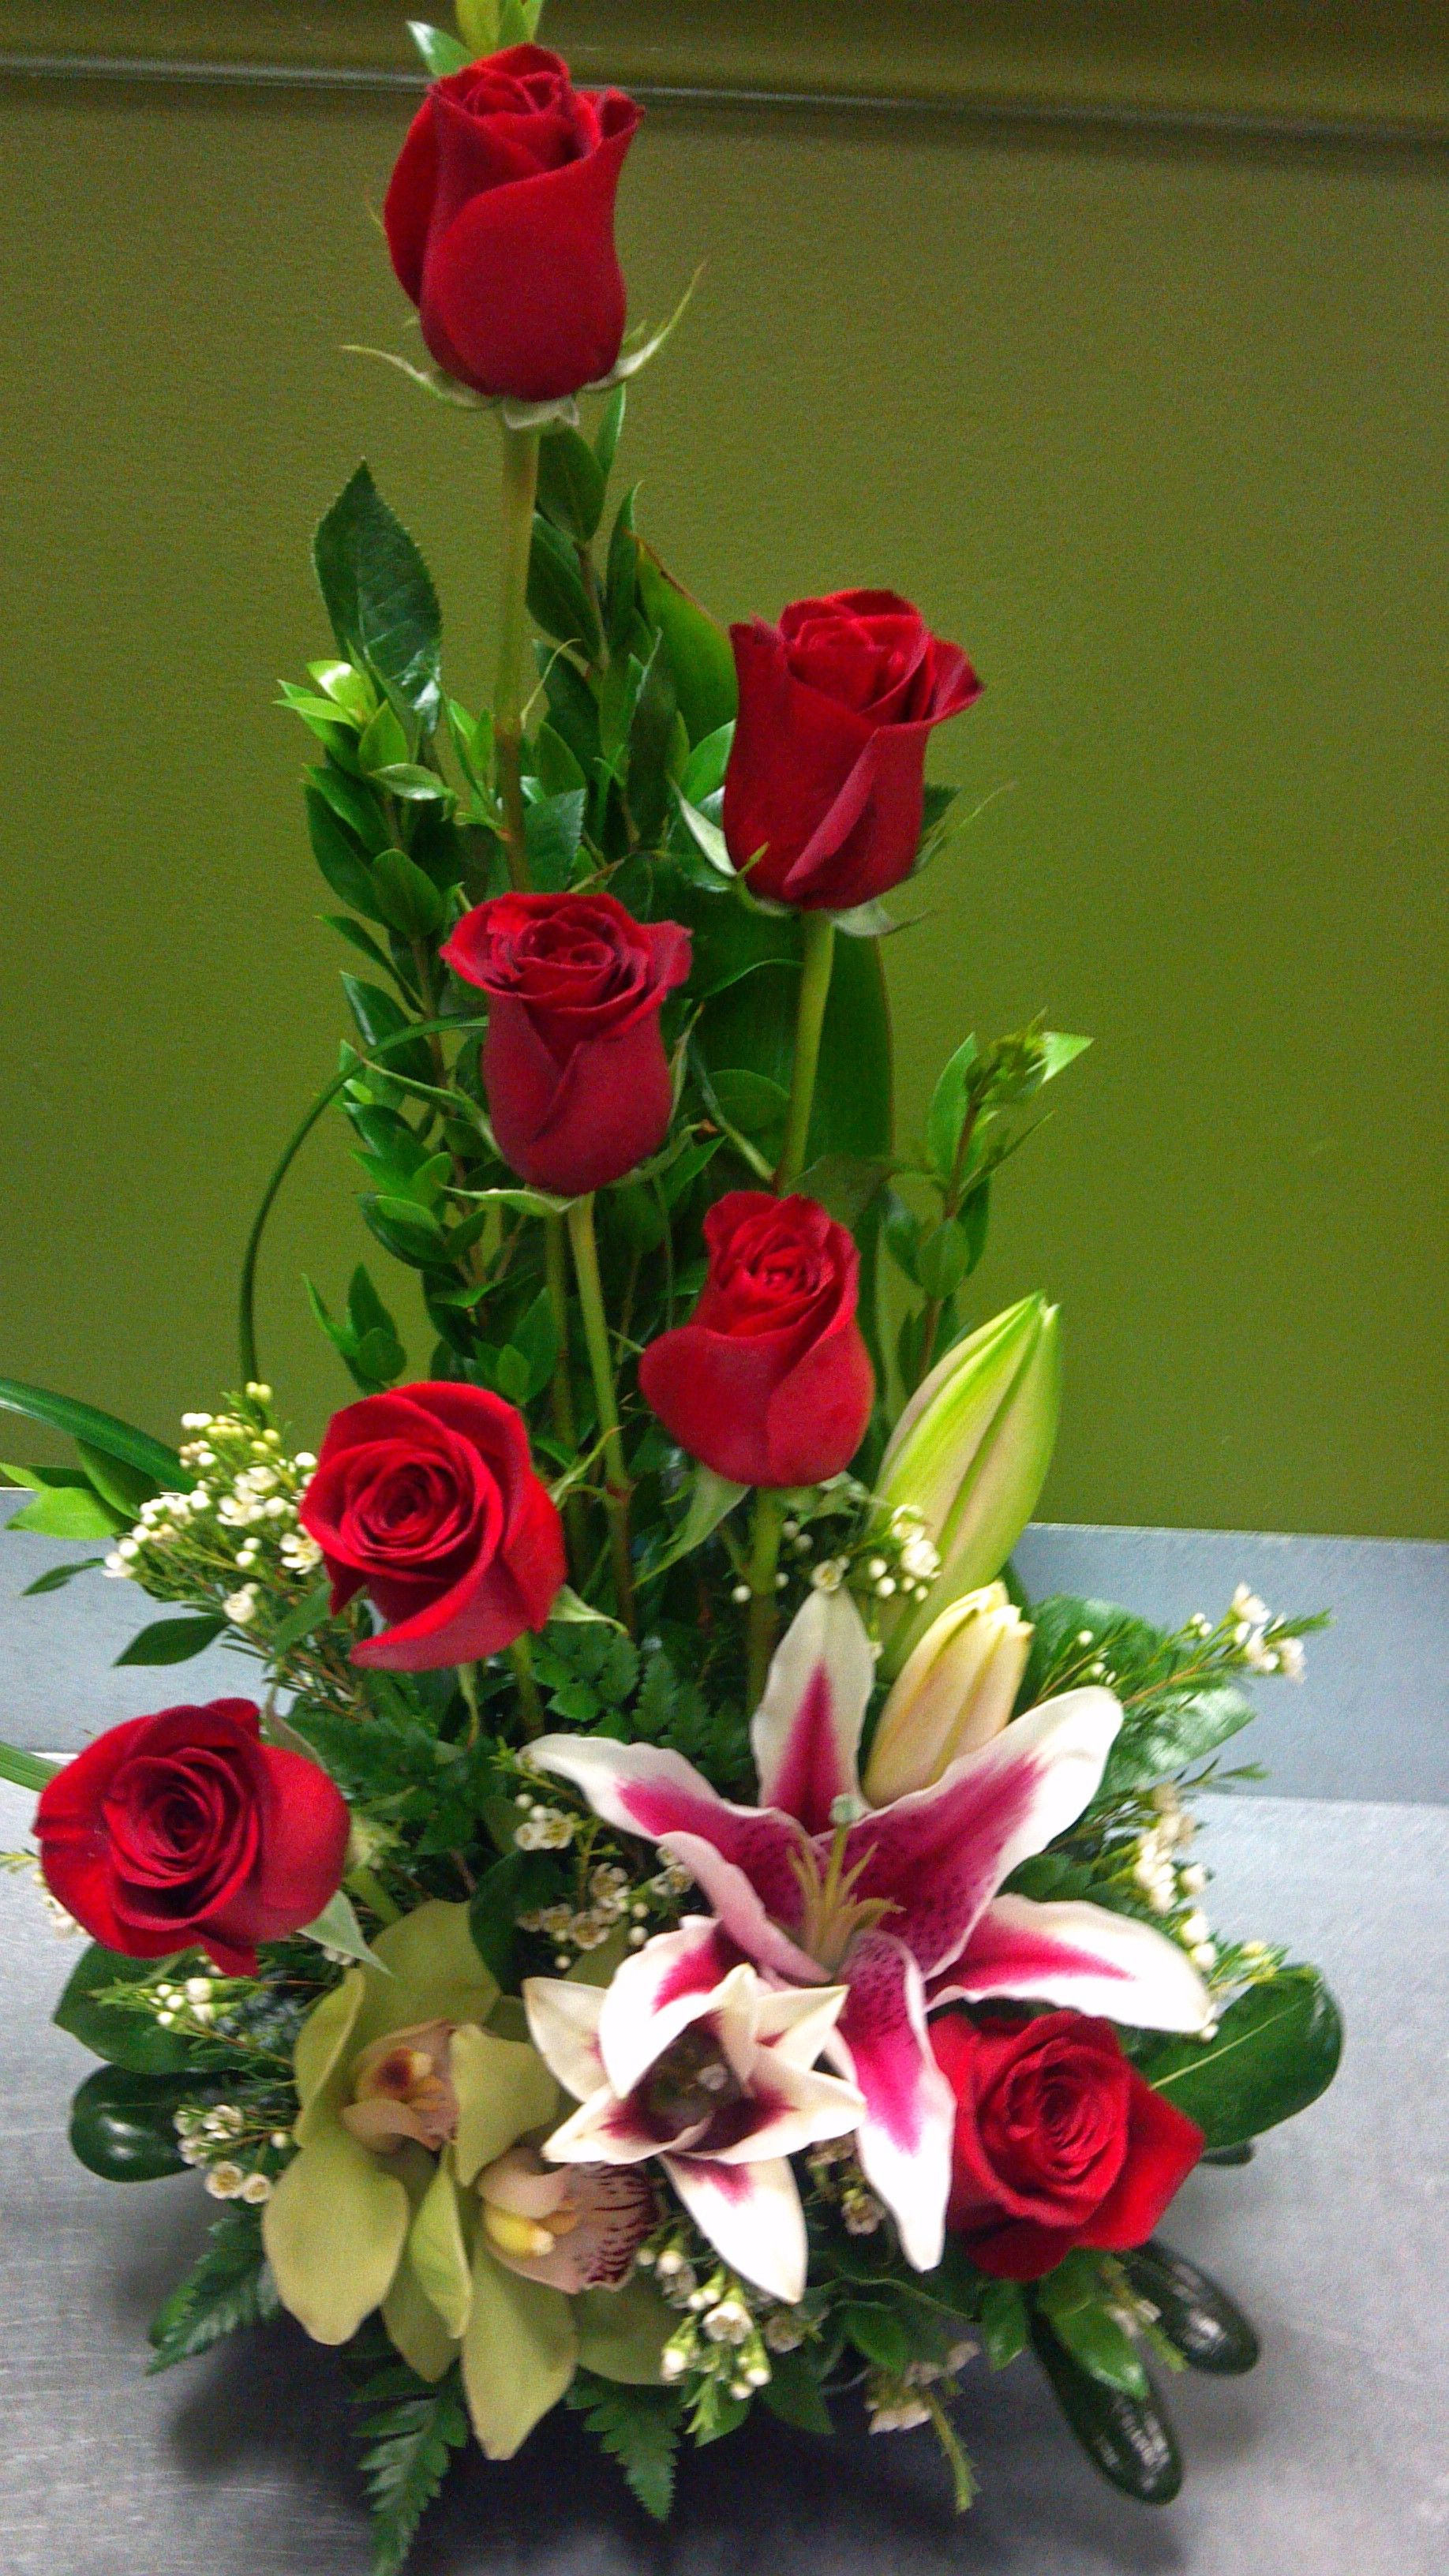 7 Red Roses Arreglosflorales Arreglos Florales Arreglos